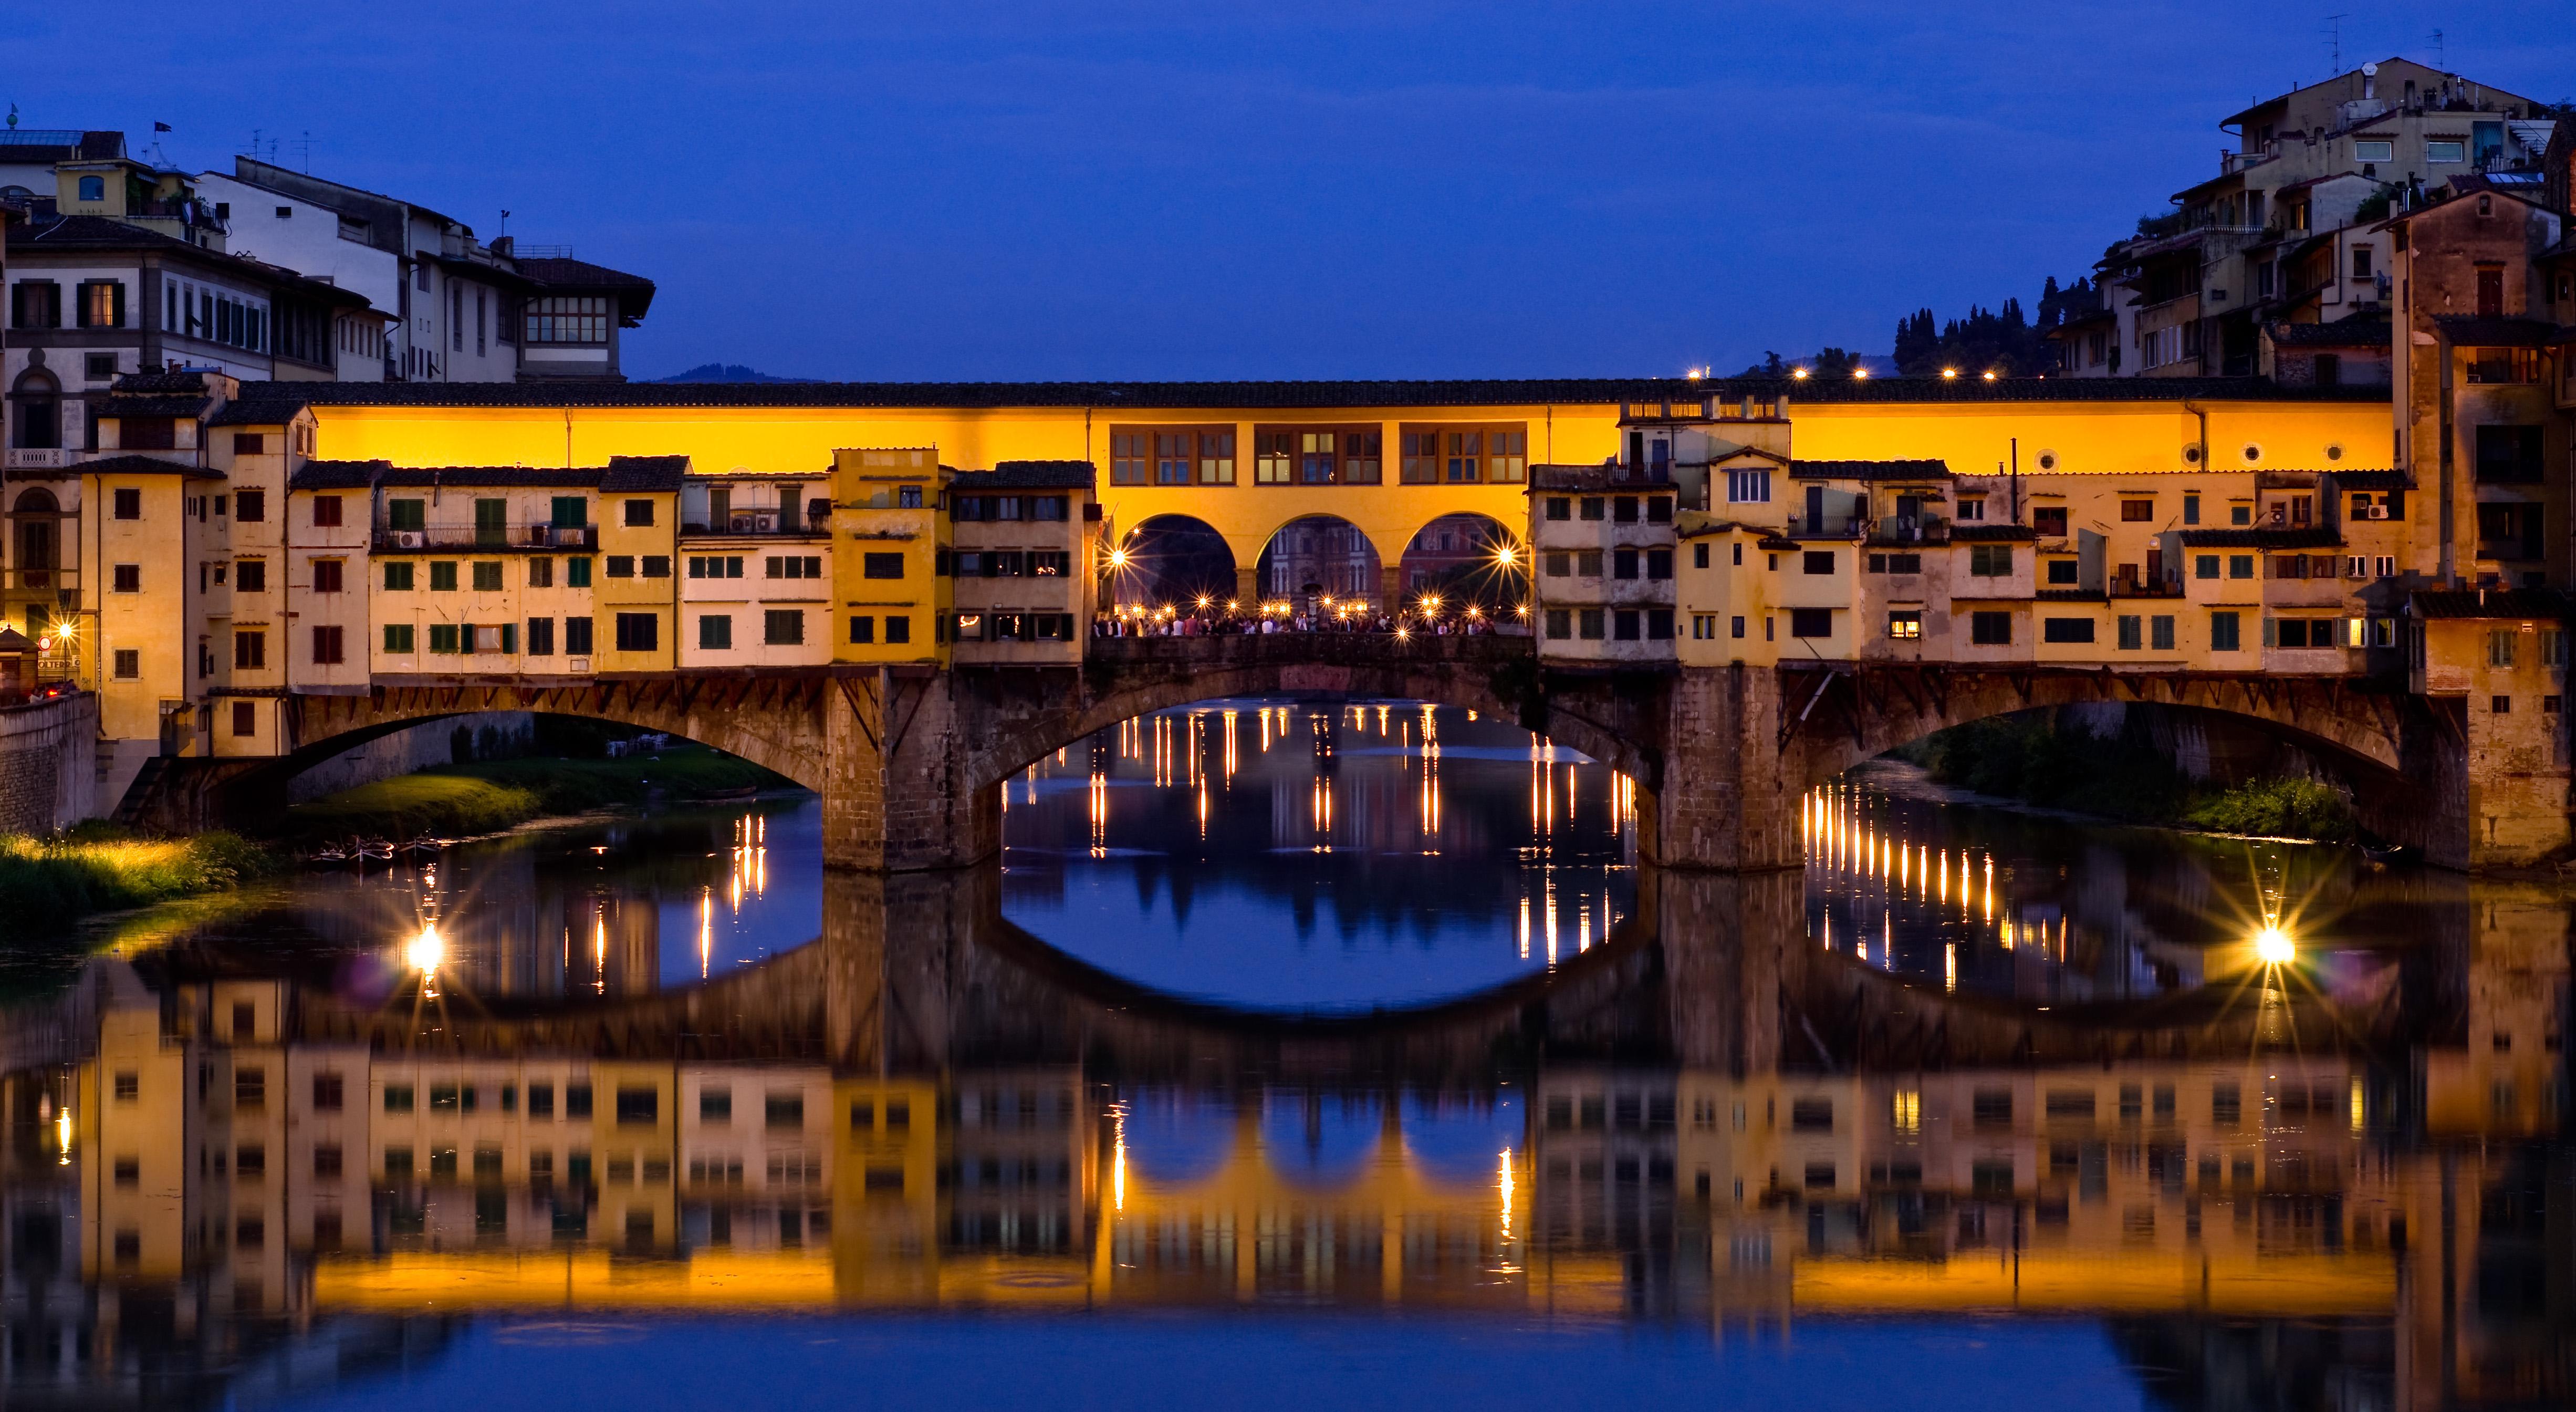 Ponte Vecchio, Night | robert kent photography